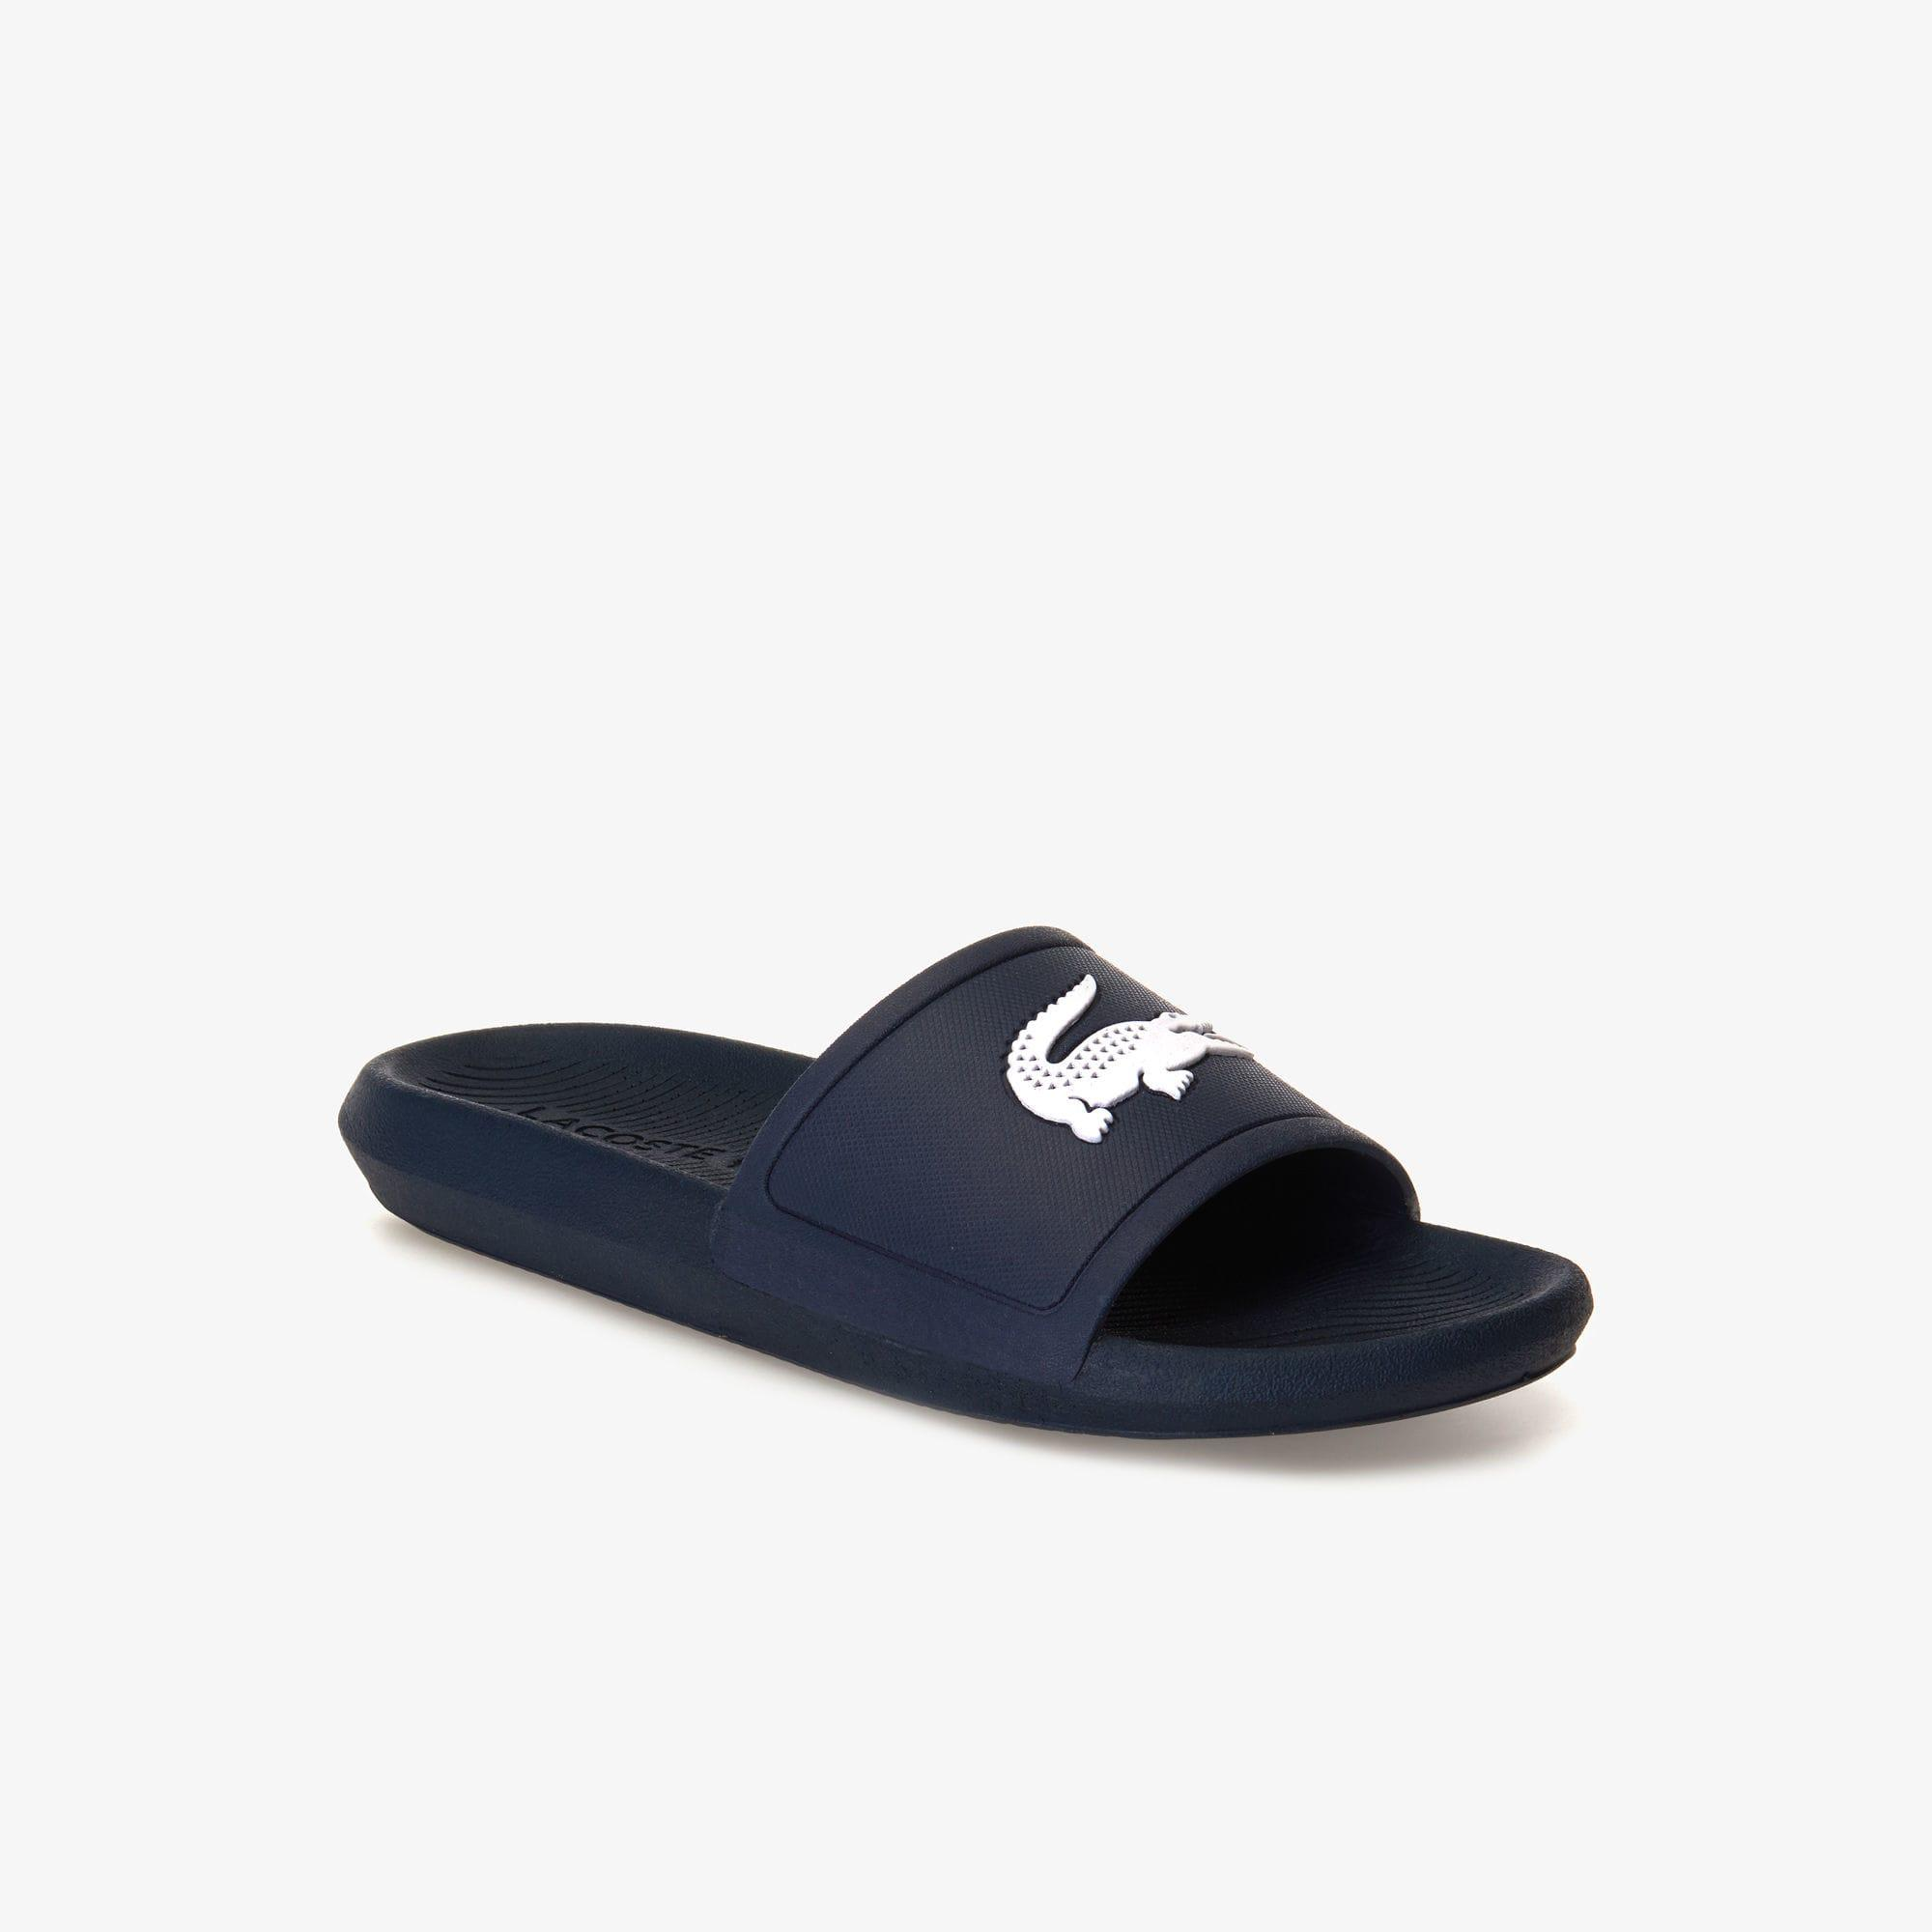 4f27e19f9 Lyst - Lacoste Women s Croco 119 1 Cfa Sliders Blue in Blue